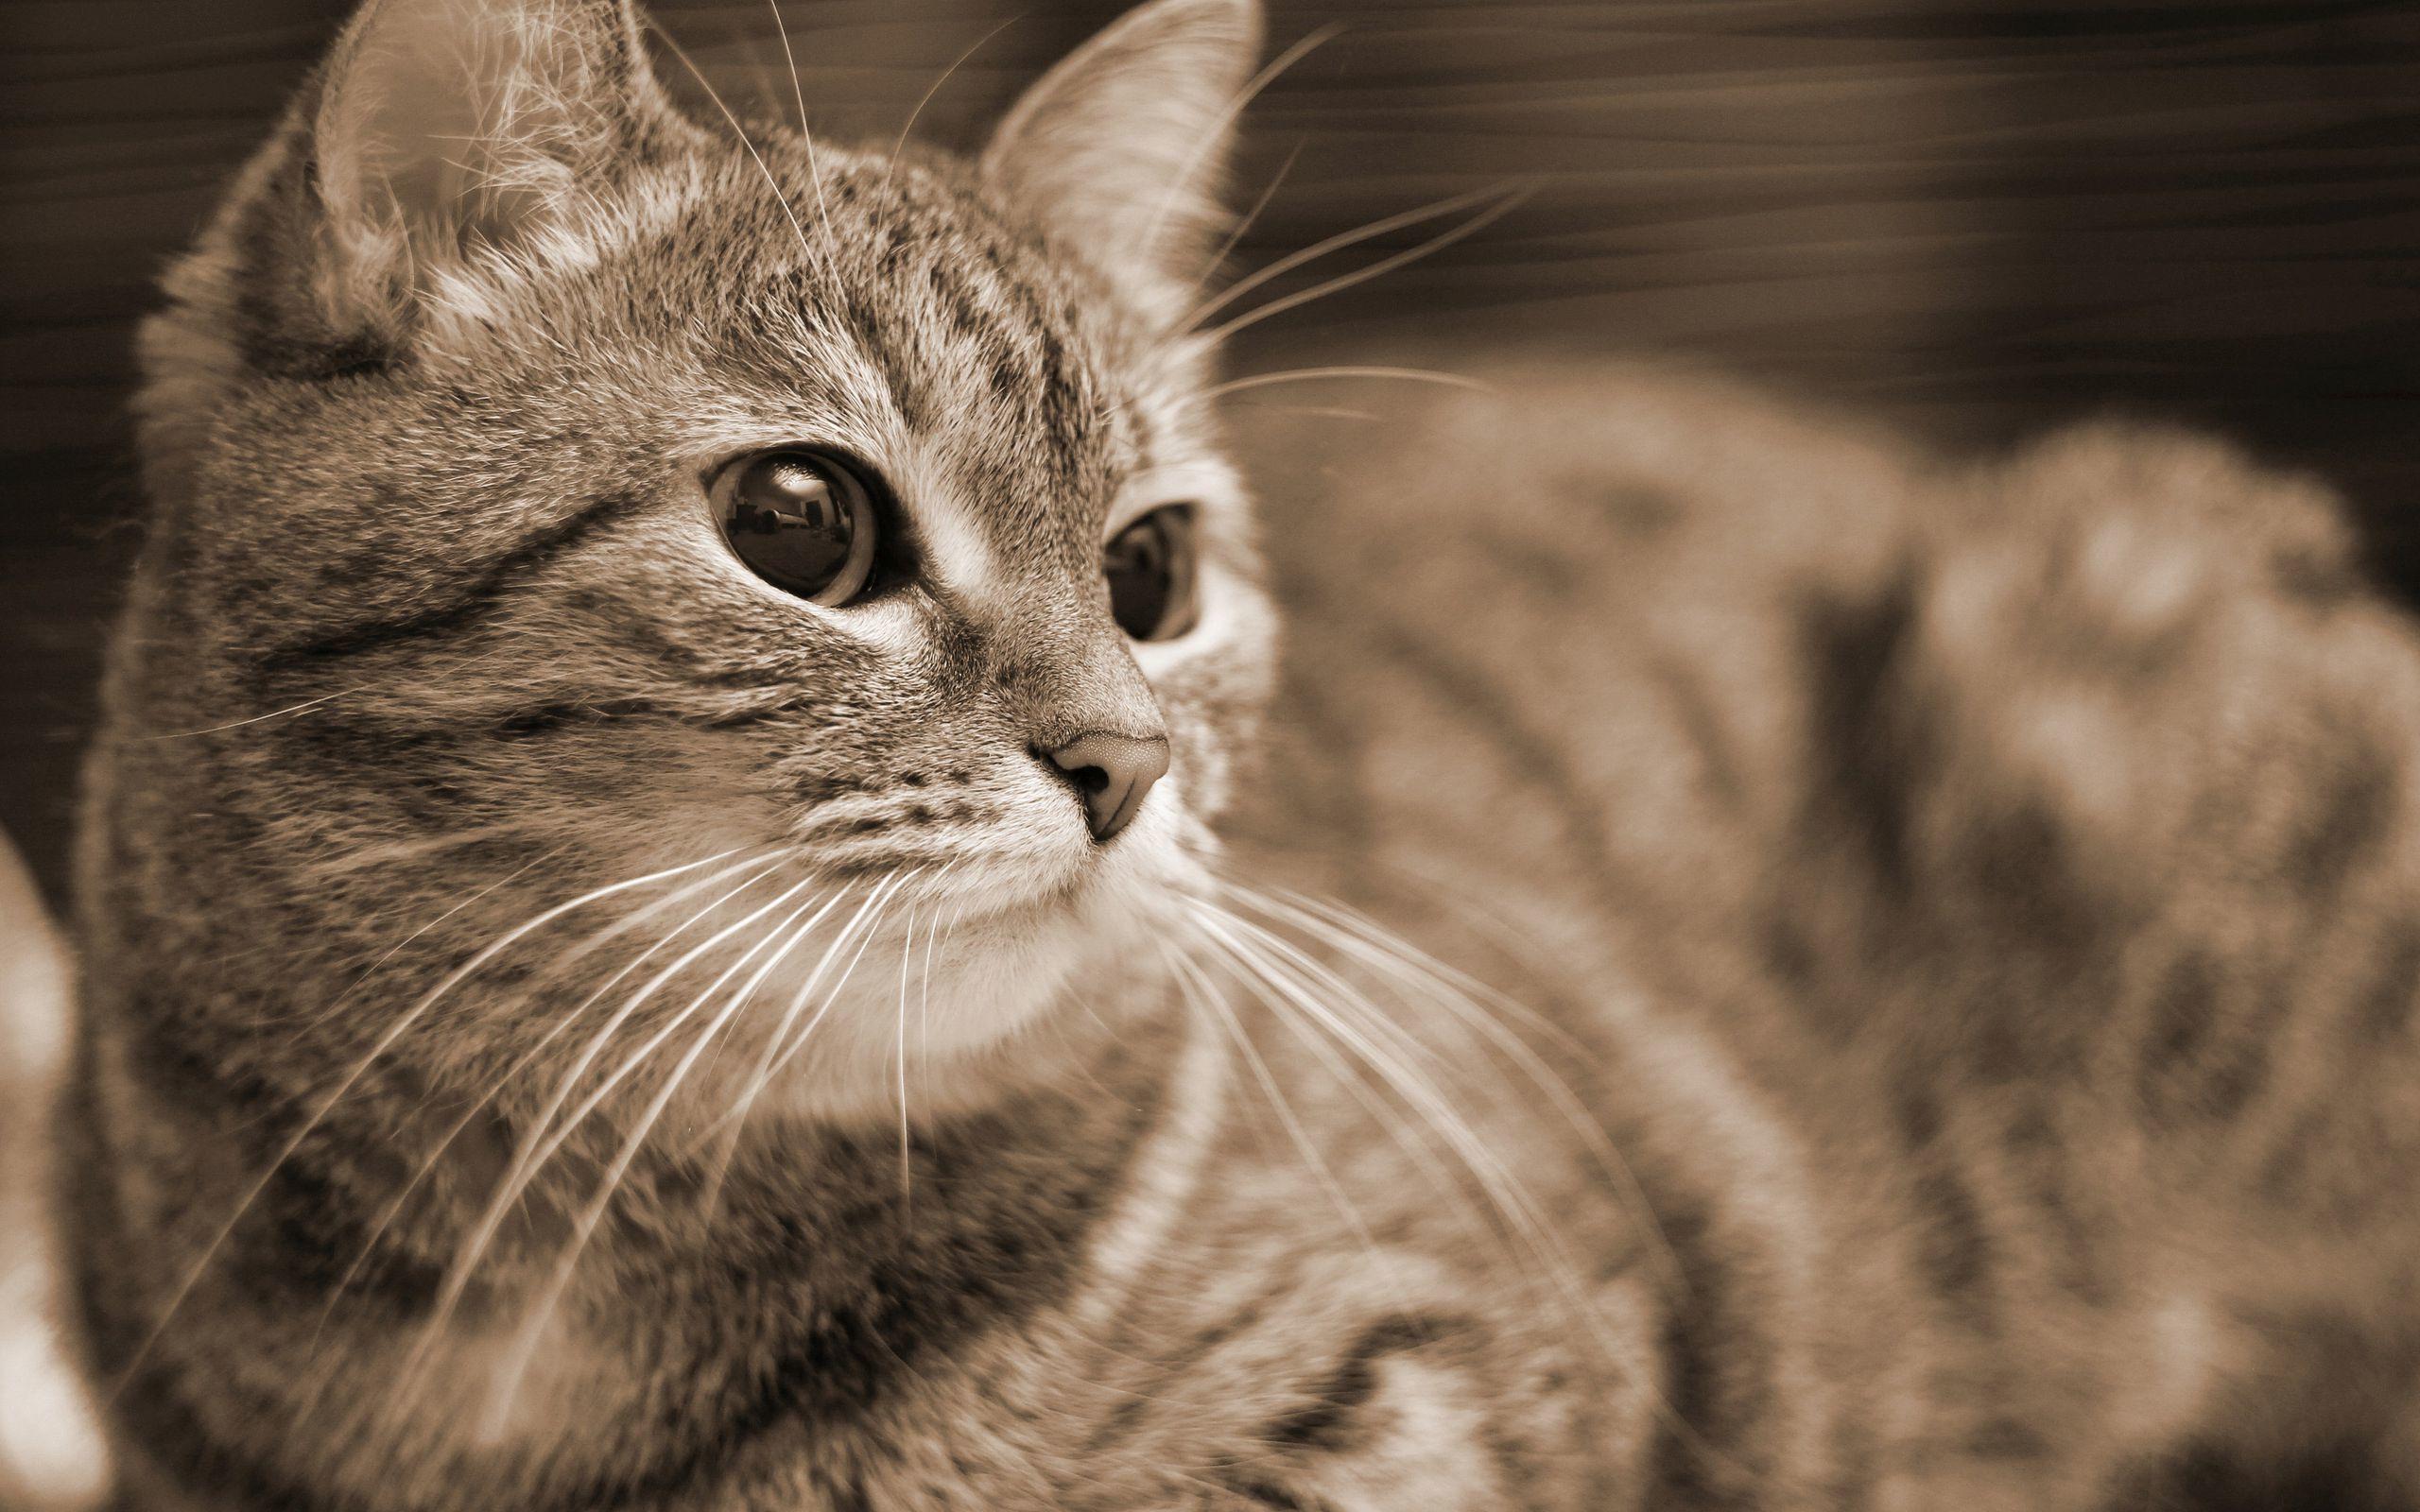 tabby-cat-resting-2560x1600-animal-desktop-wallpaper-27910